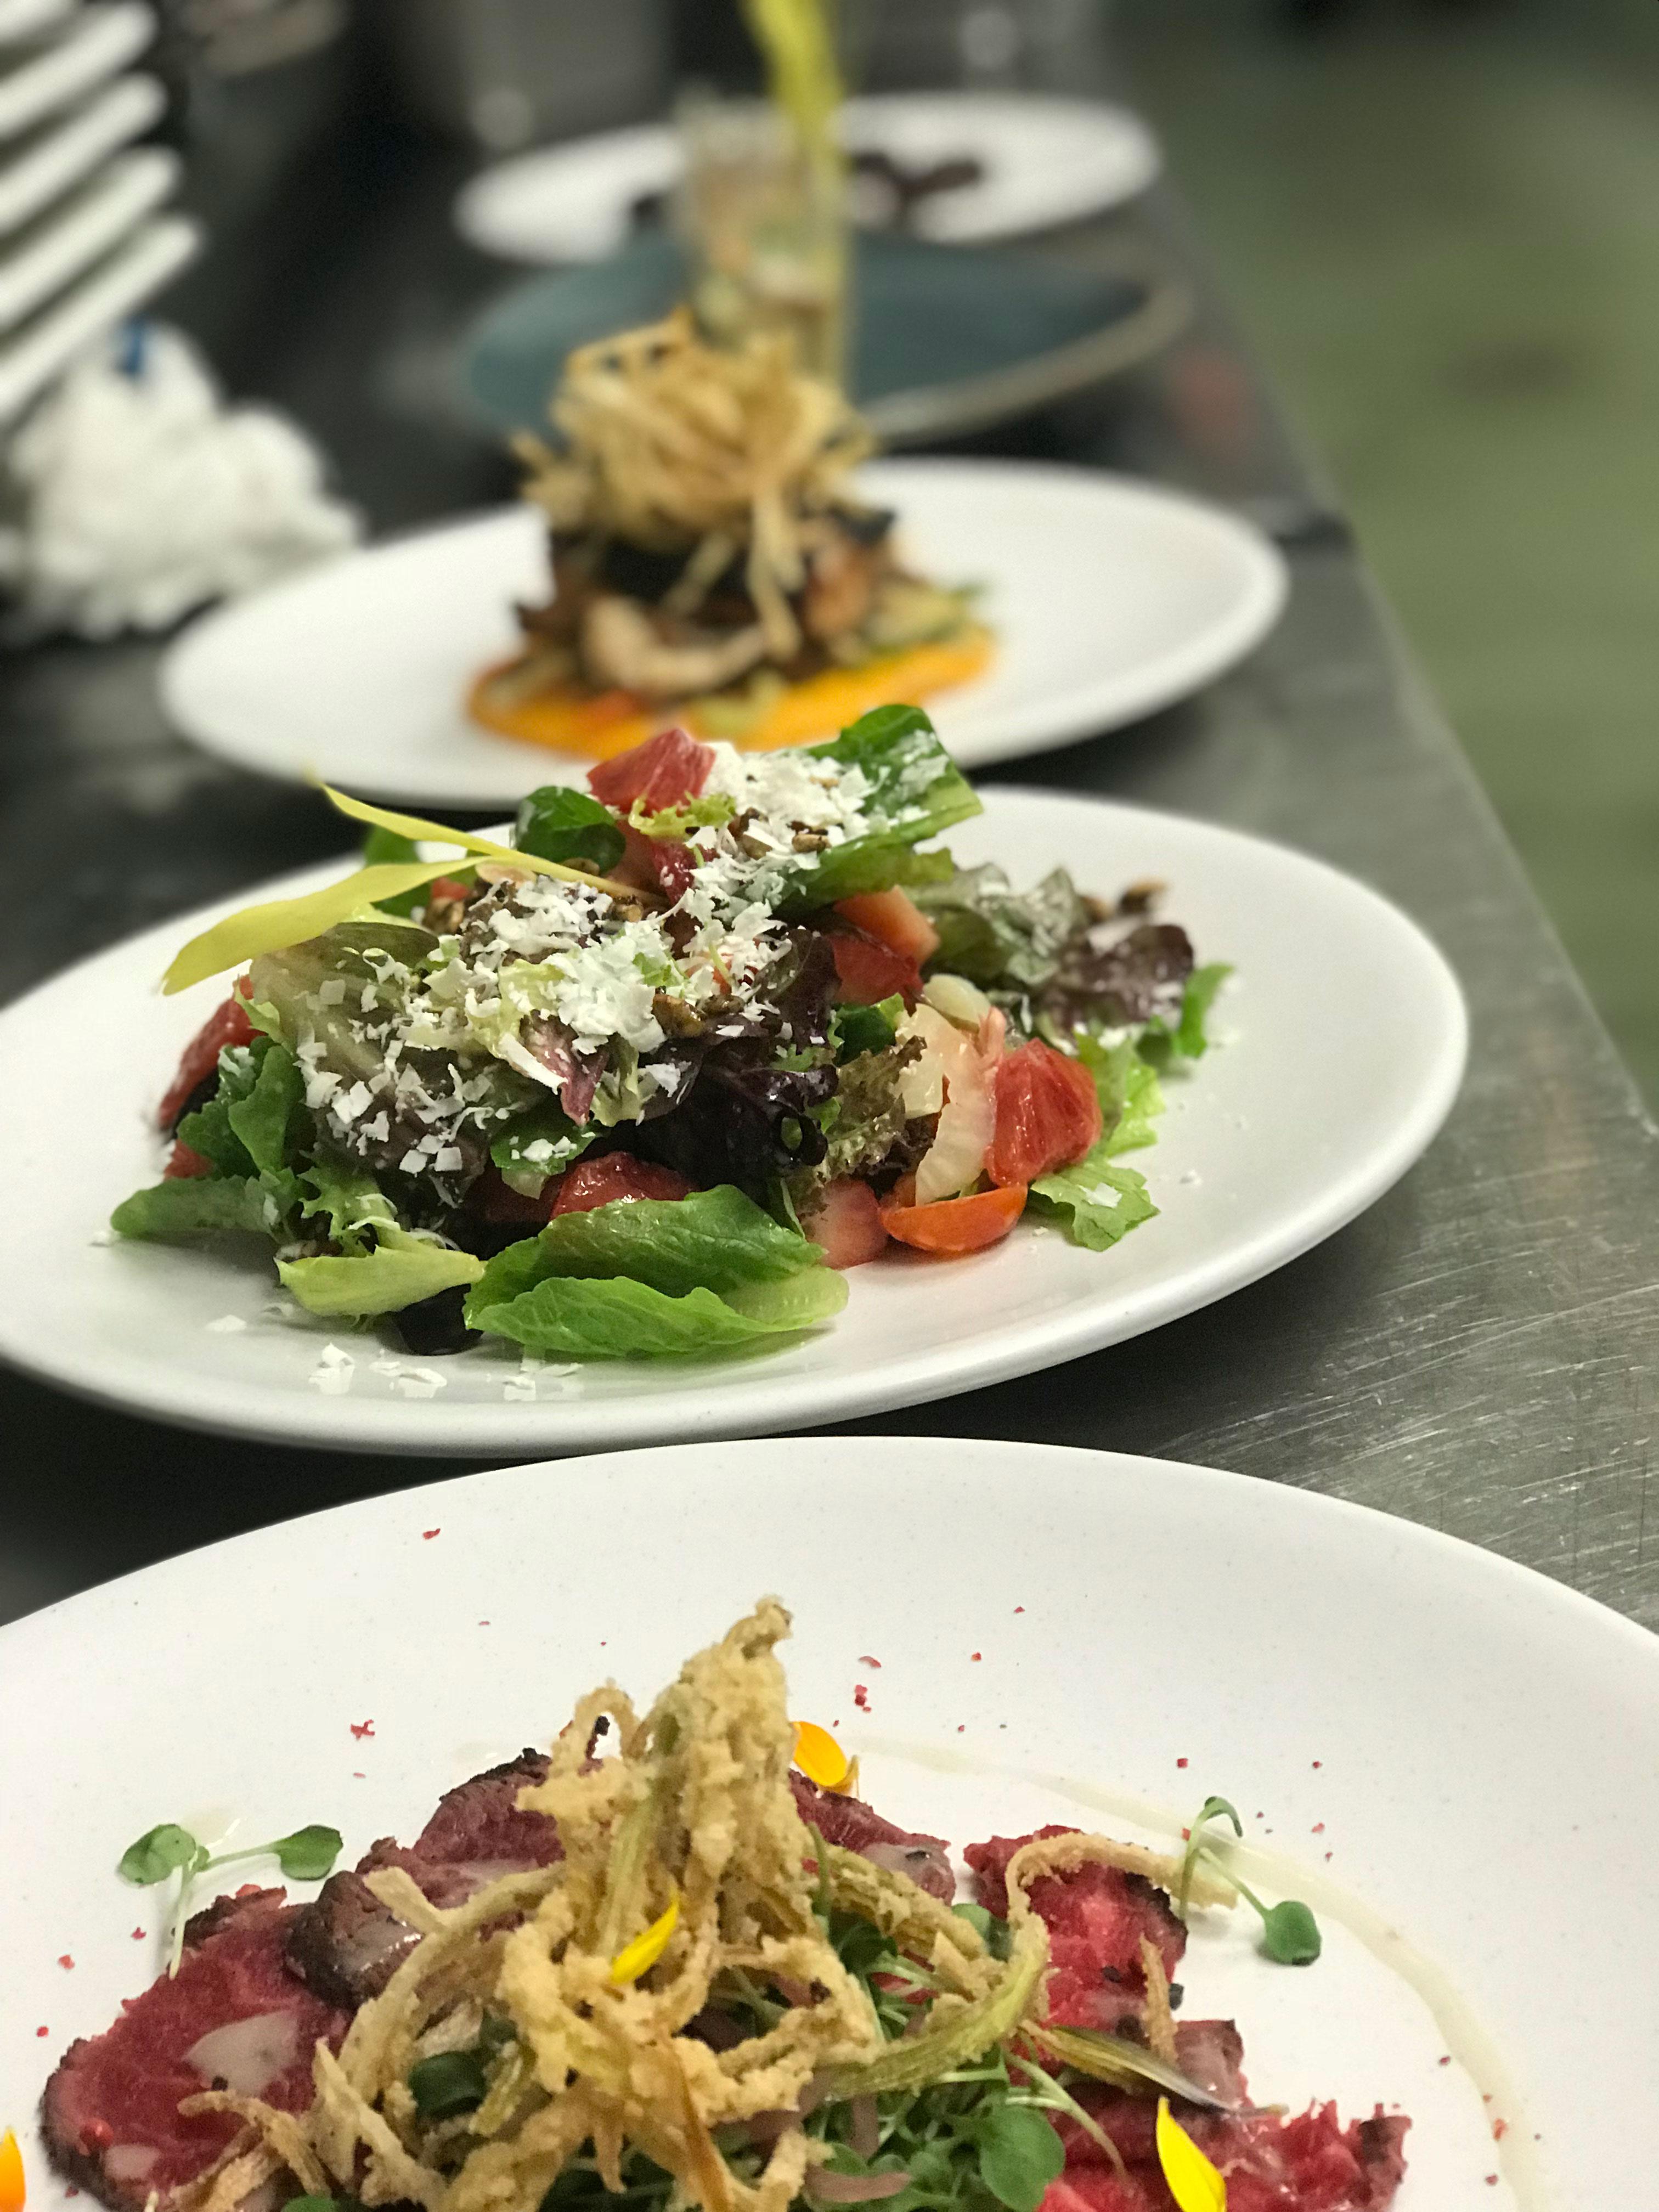 San Diego chef Deborah Scott dines at San Diego restaurant Poseidon for seafood lunch